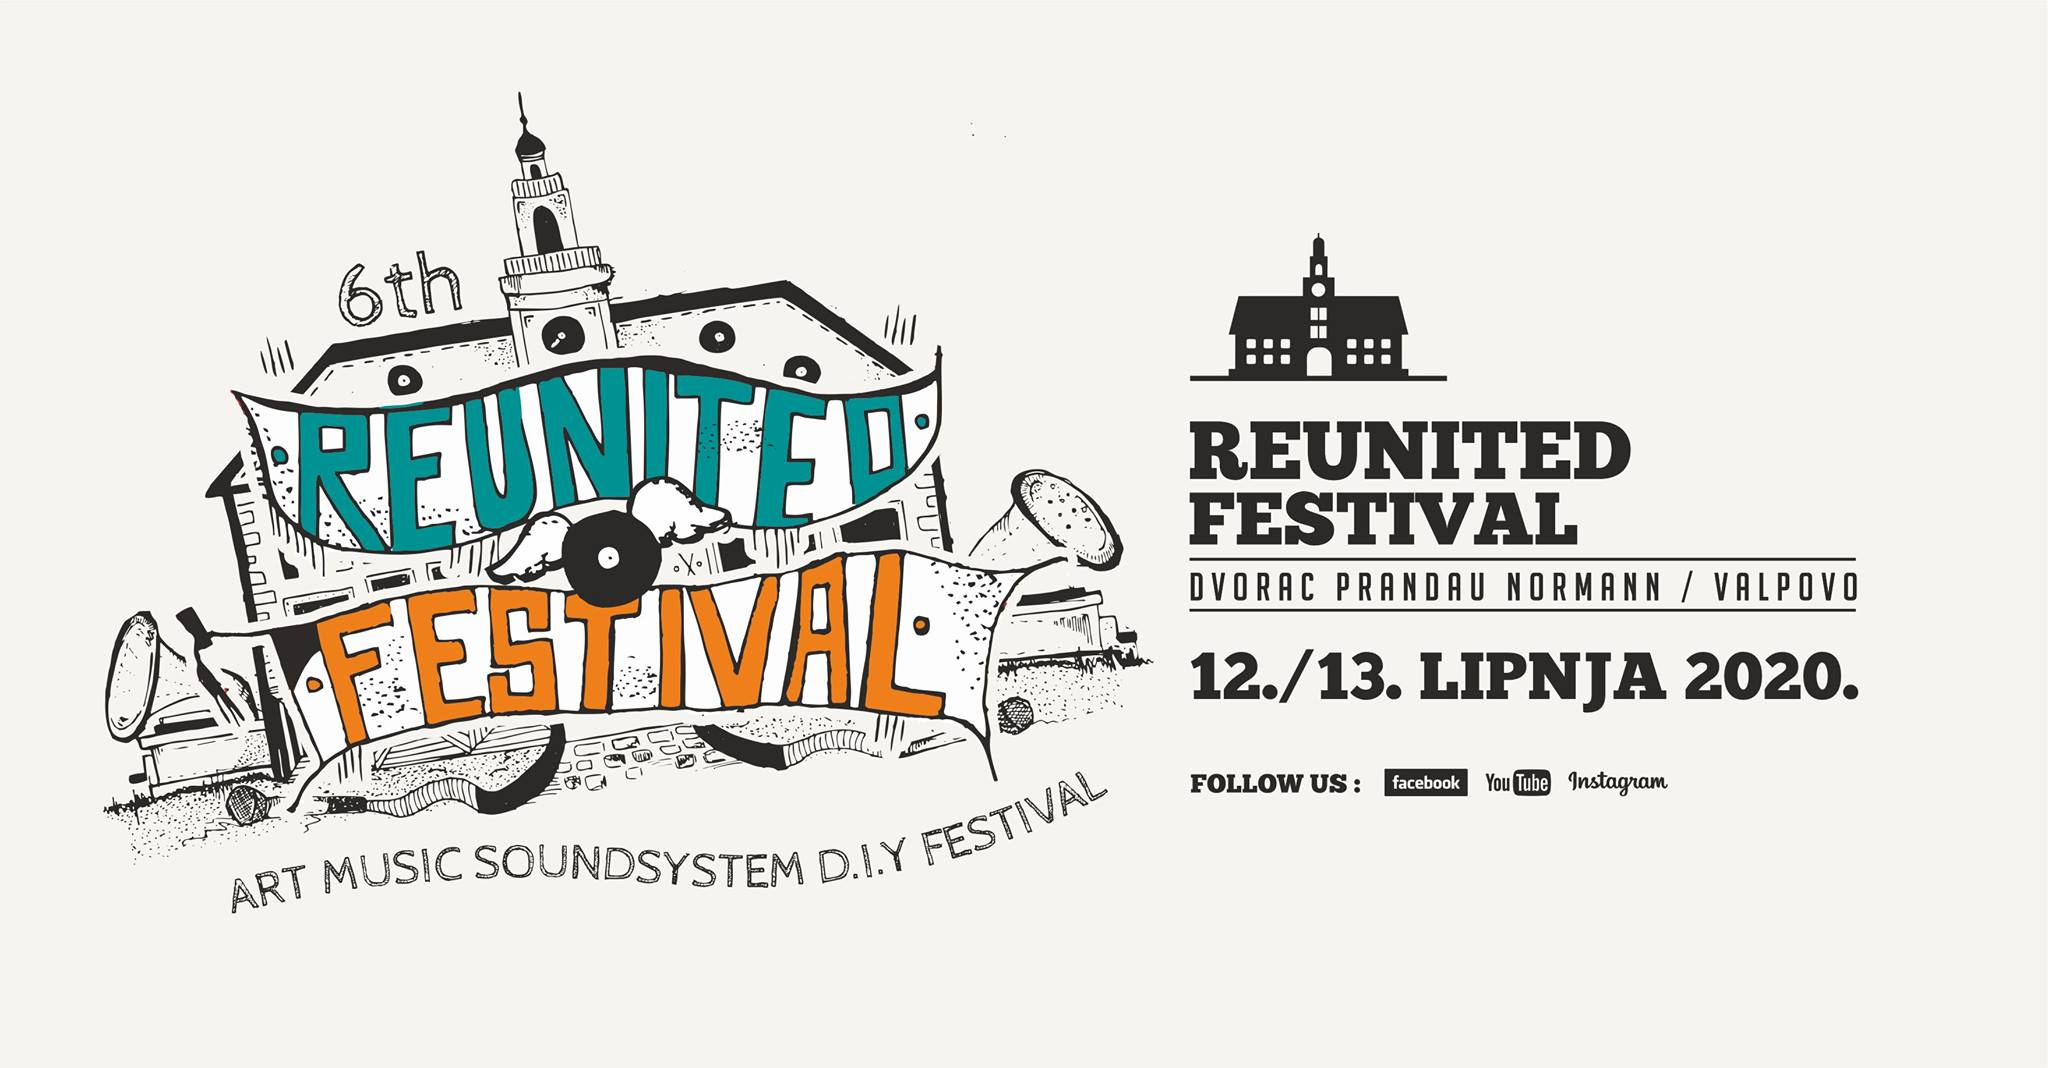 Reunited Festival - 12/13 lipanj 2020